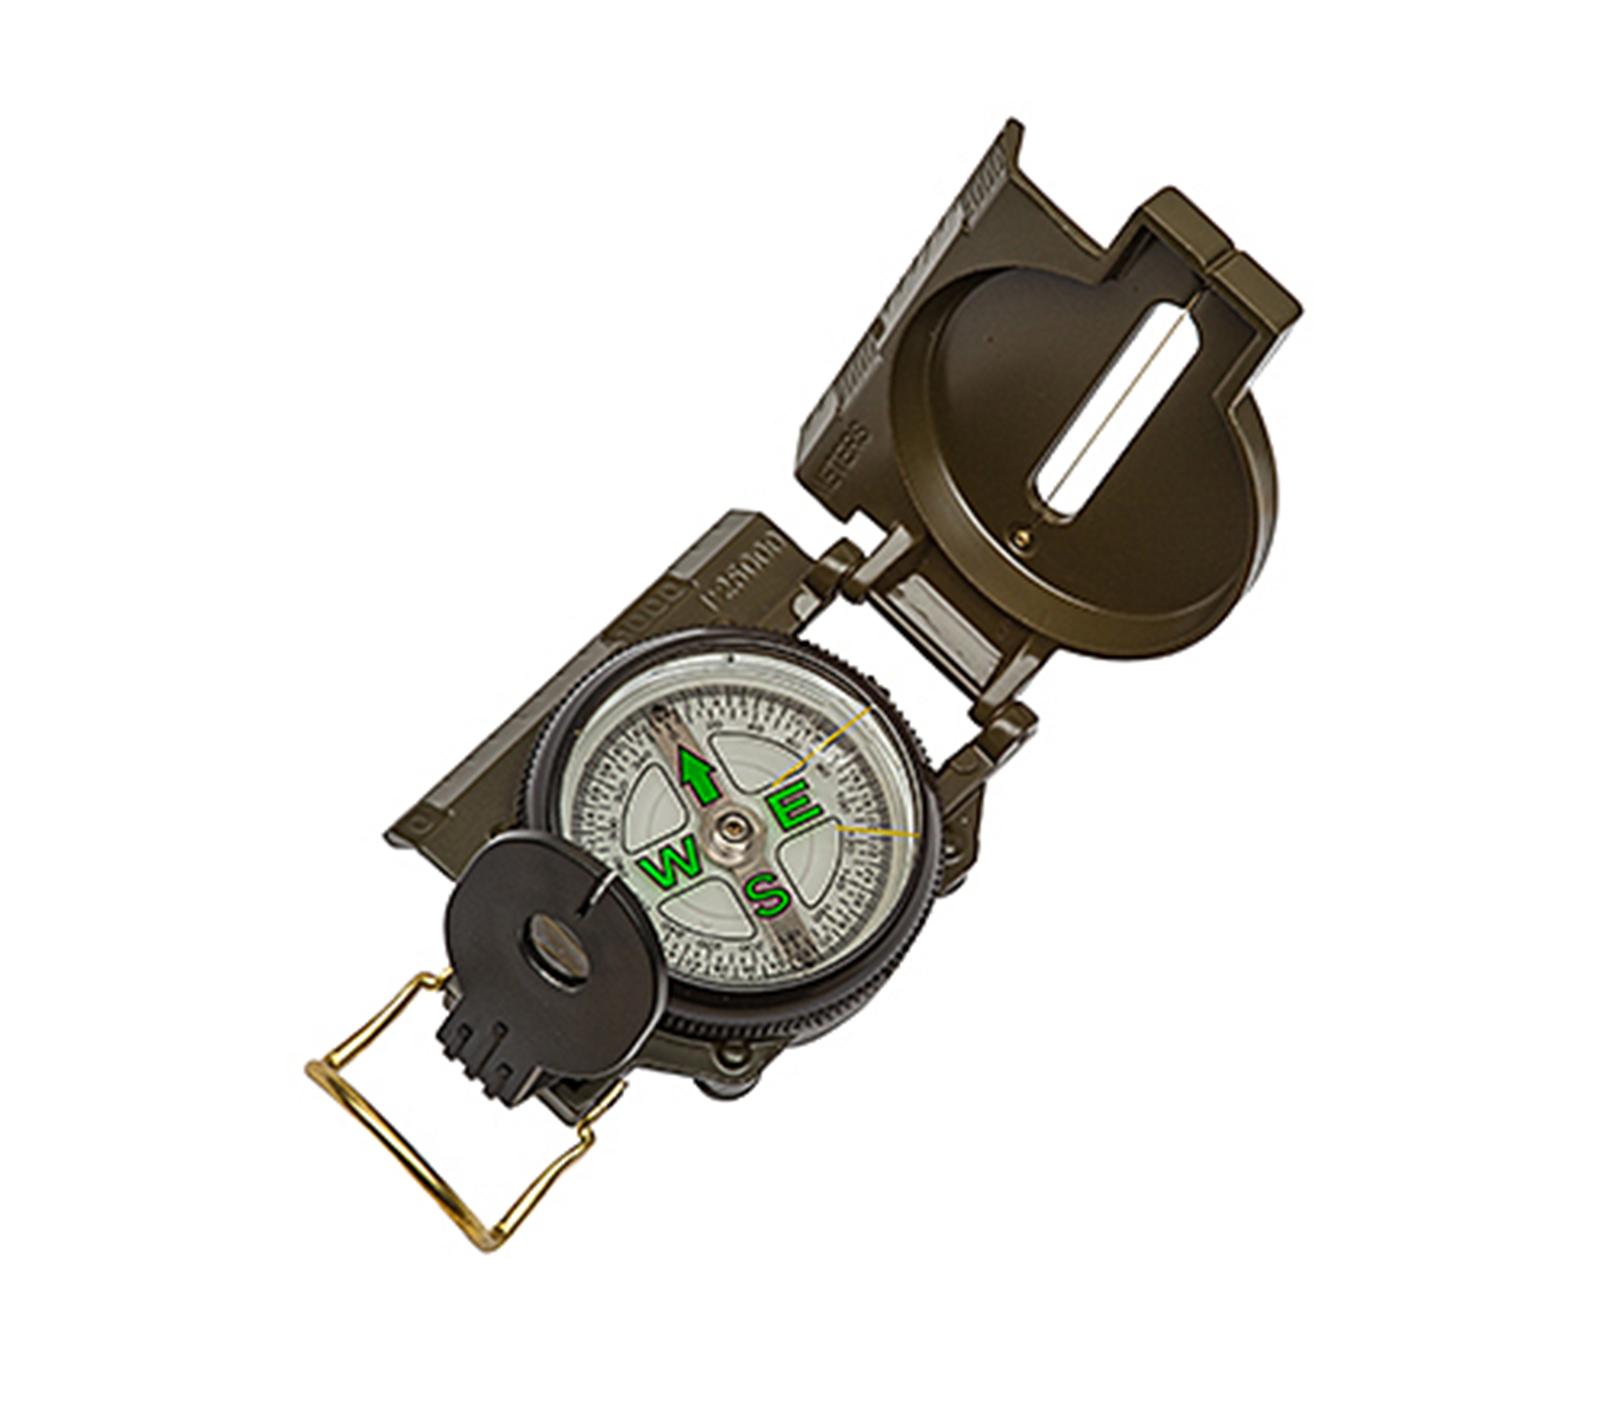 Homeij Lens Peilkompas